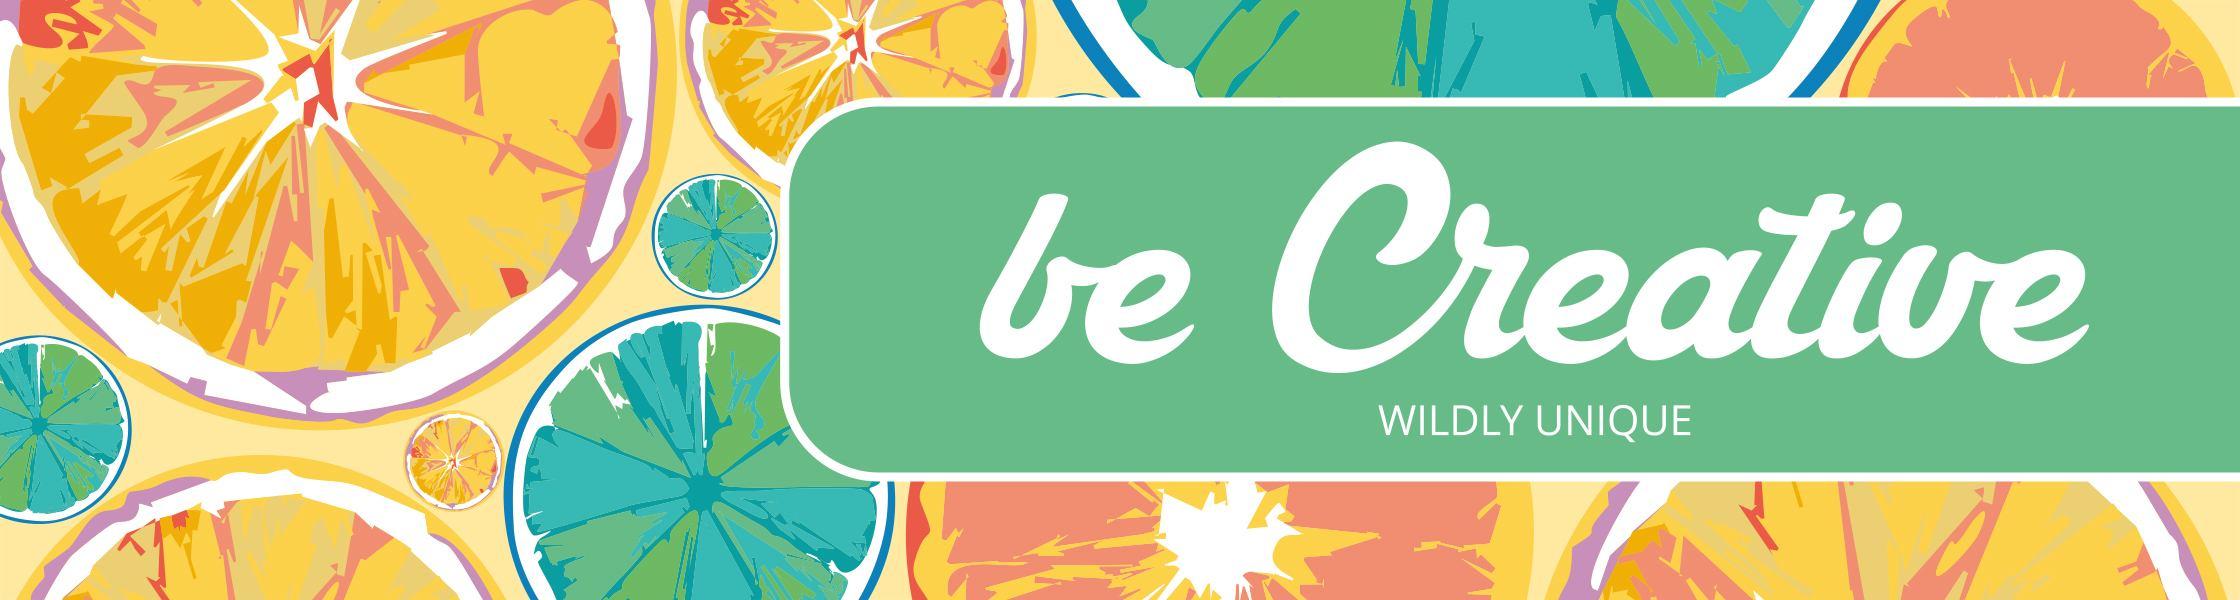 Discover our new BE CREATIVE e-catalogue!